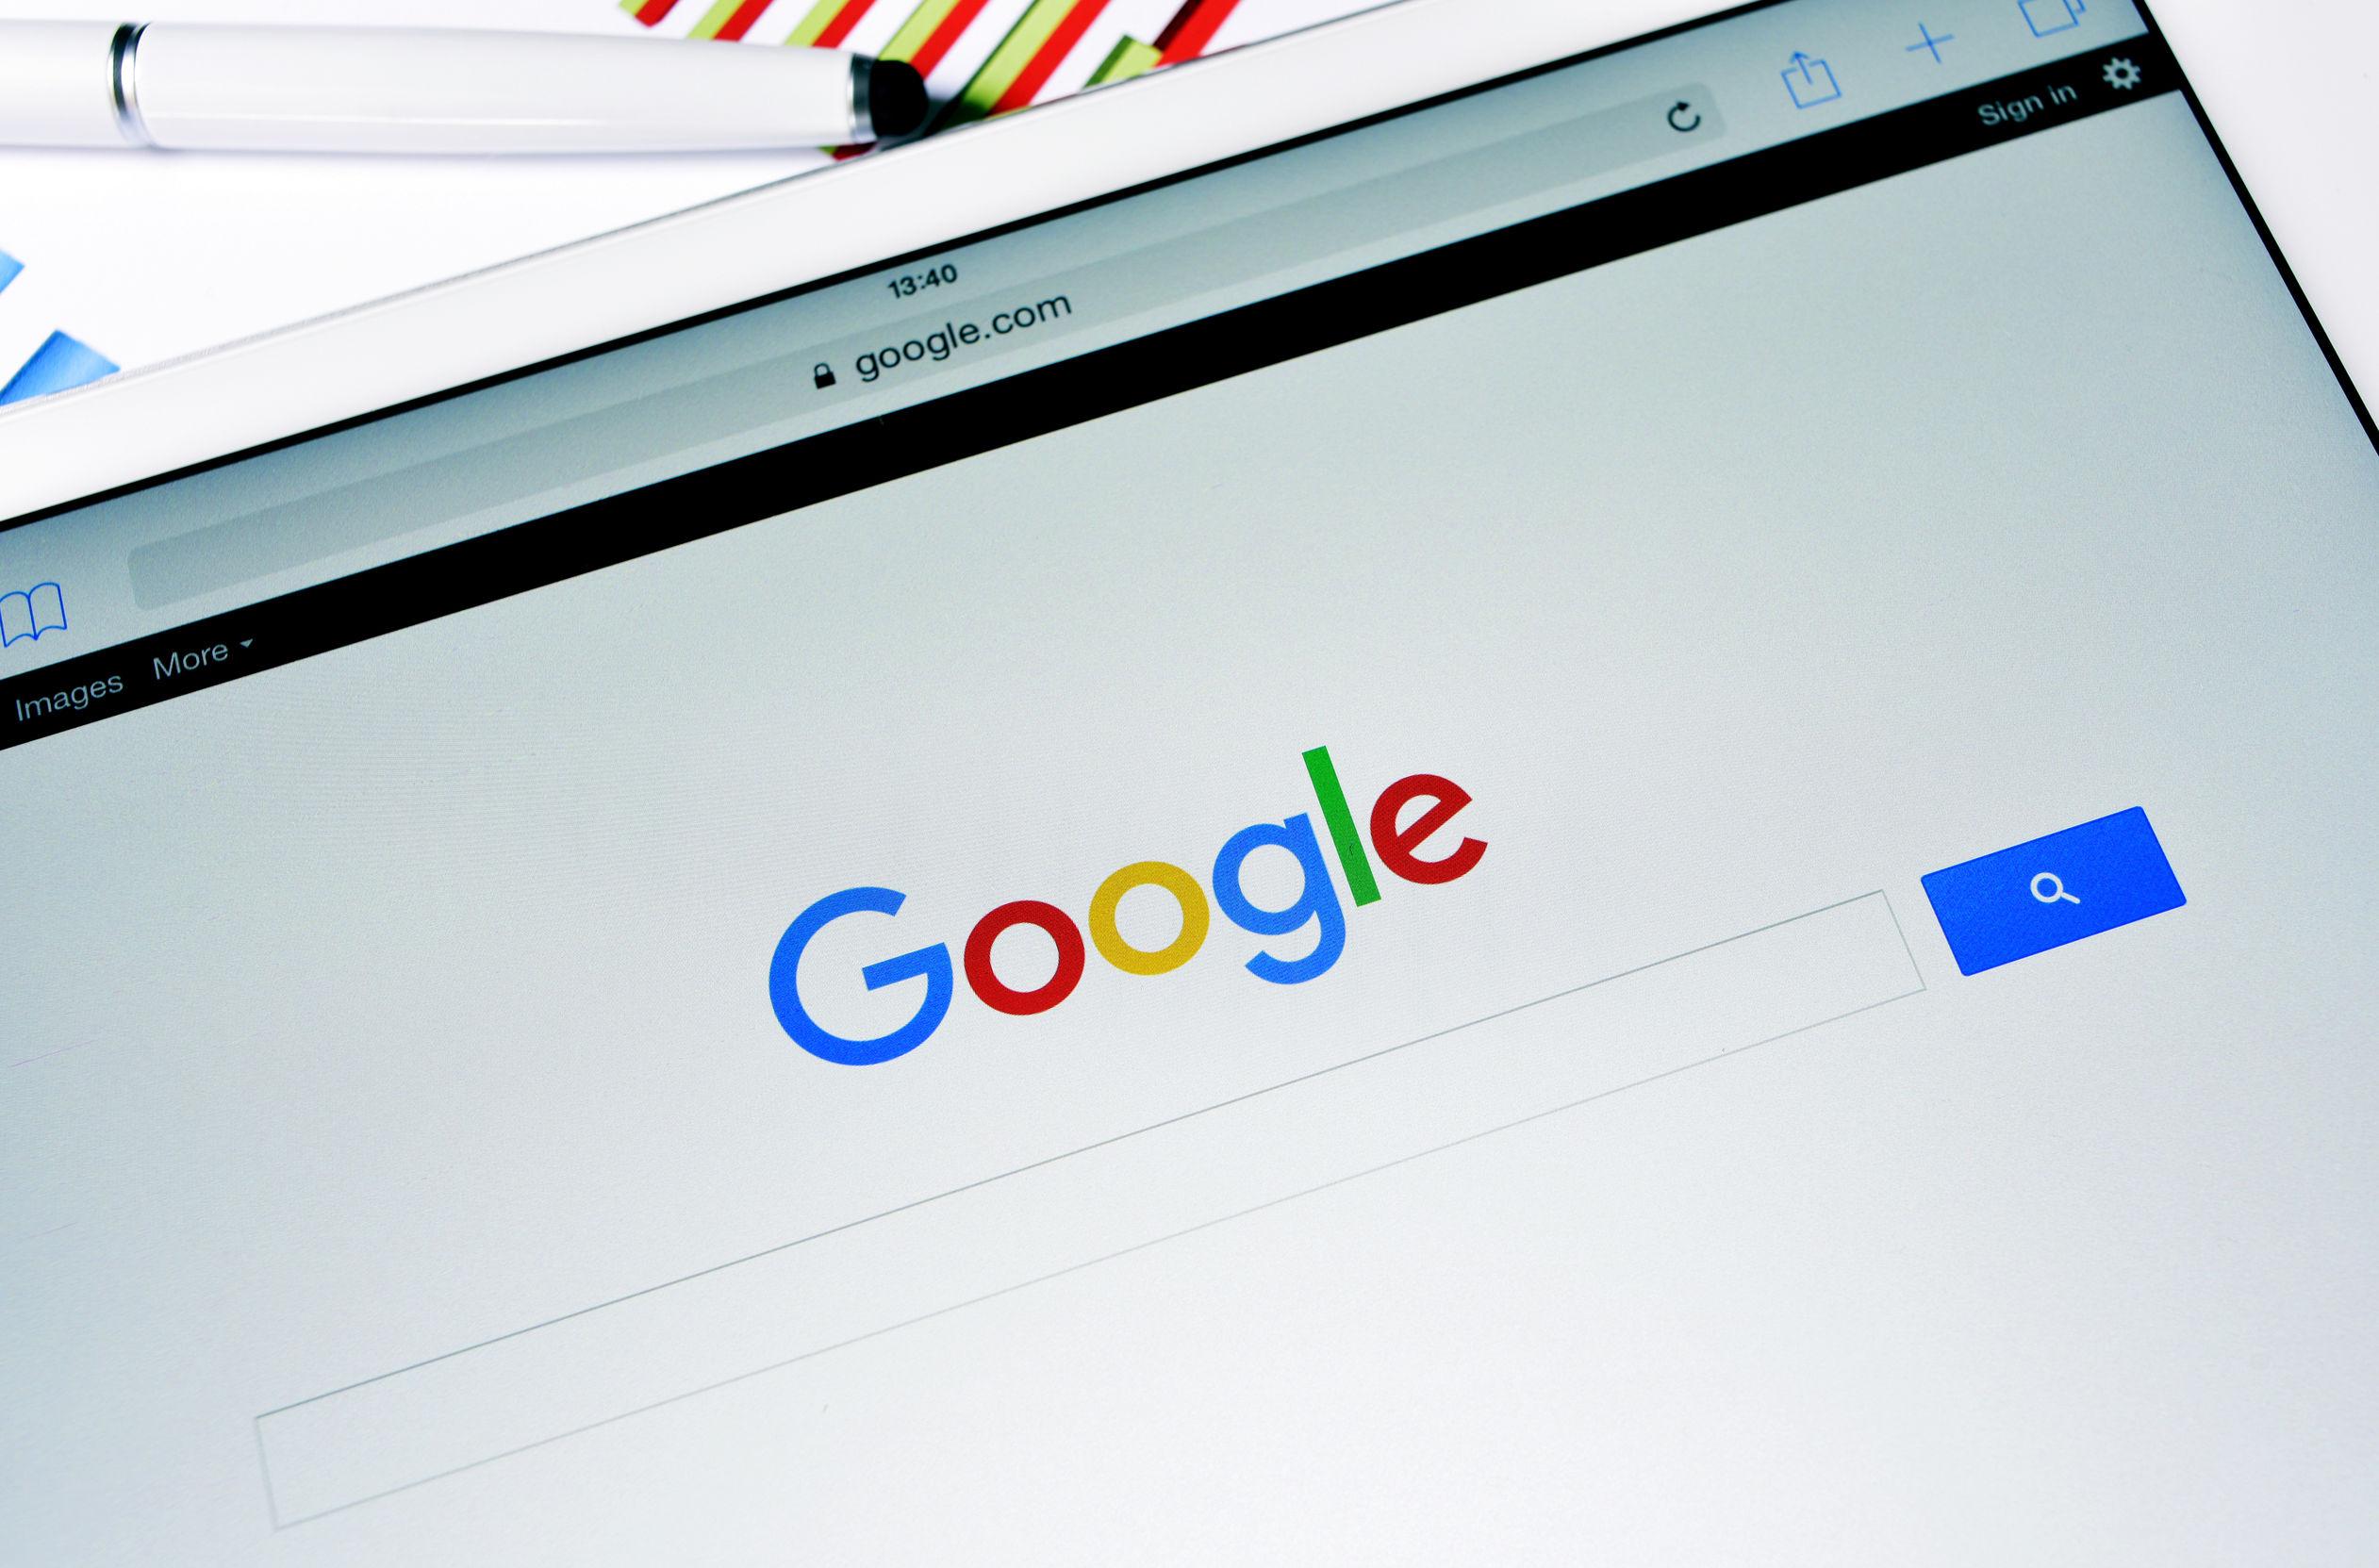 How Can My Website Get Google Top Rankings?